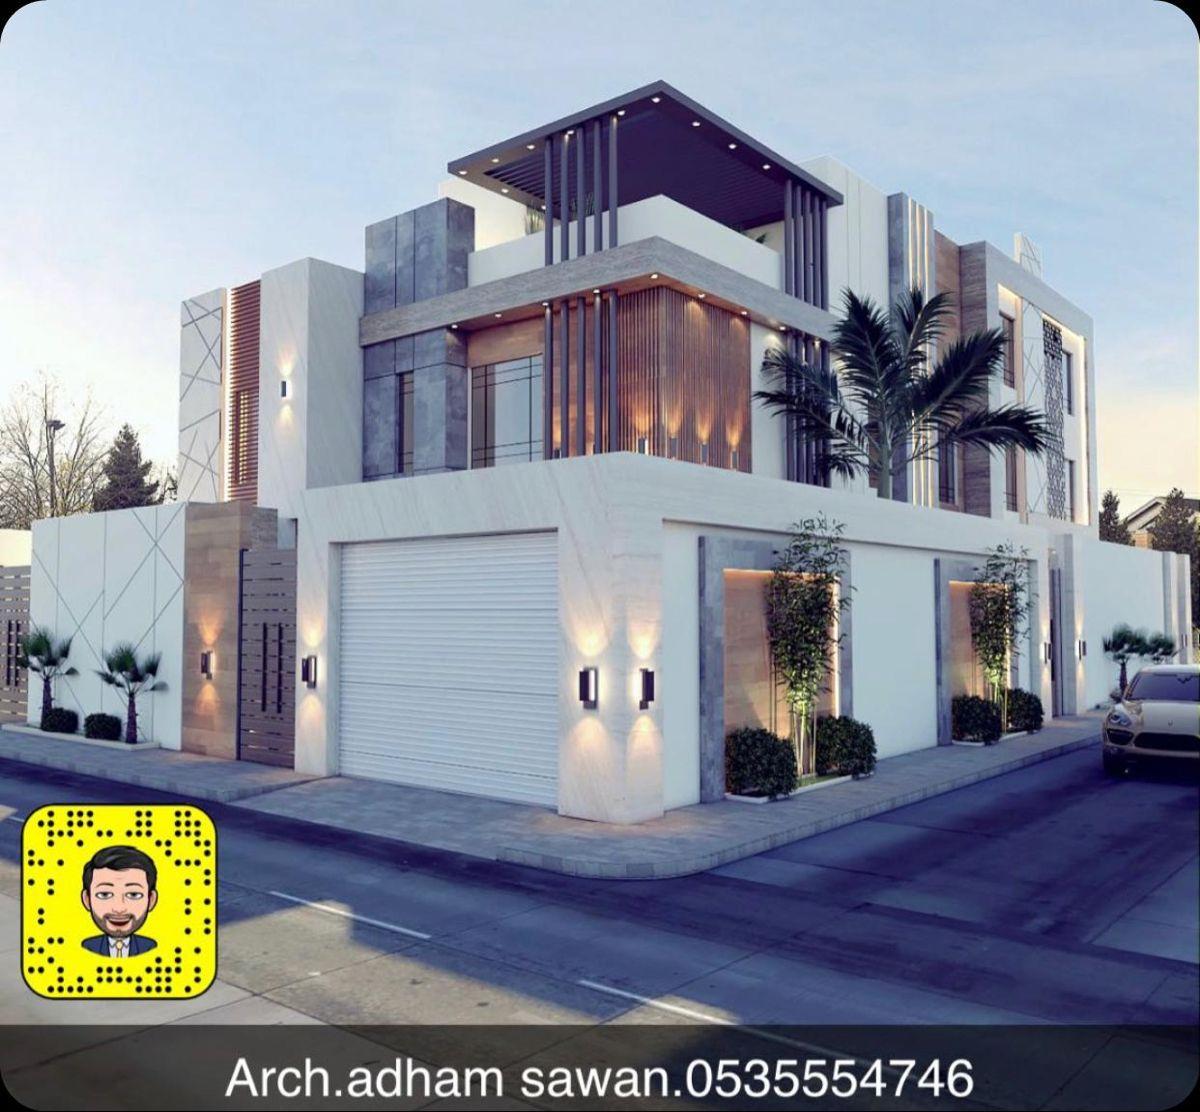 تصميم واجهه في الرياض In 2021 House Styles House Mansions